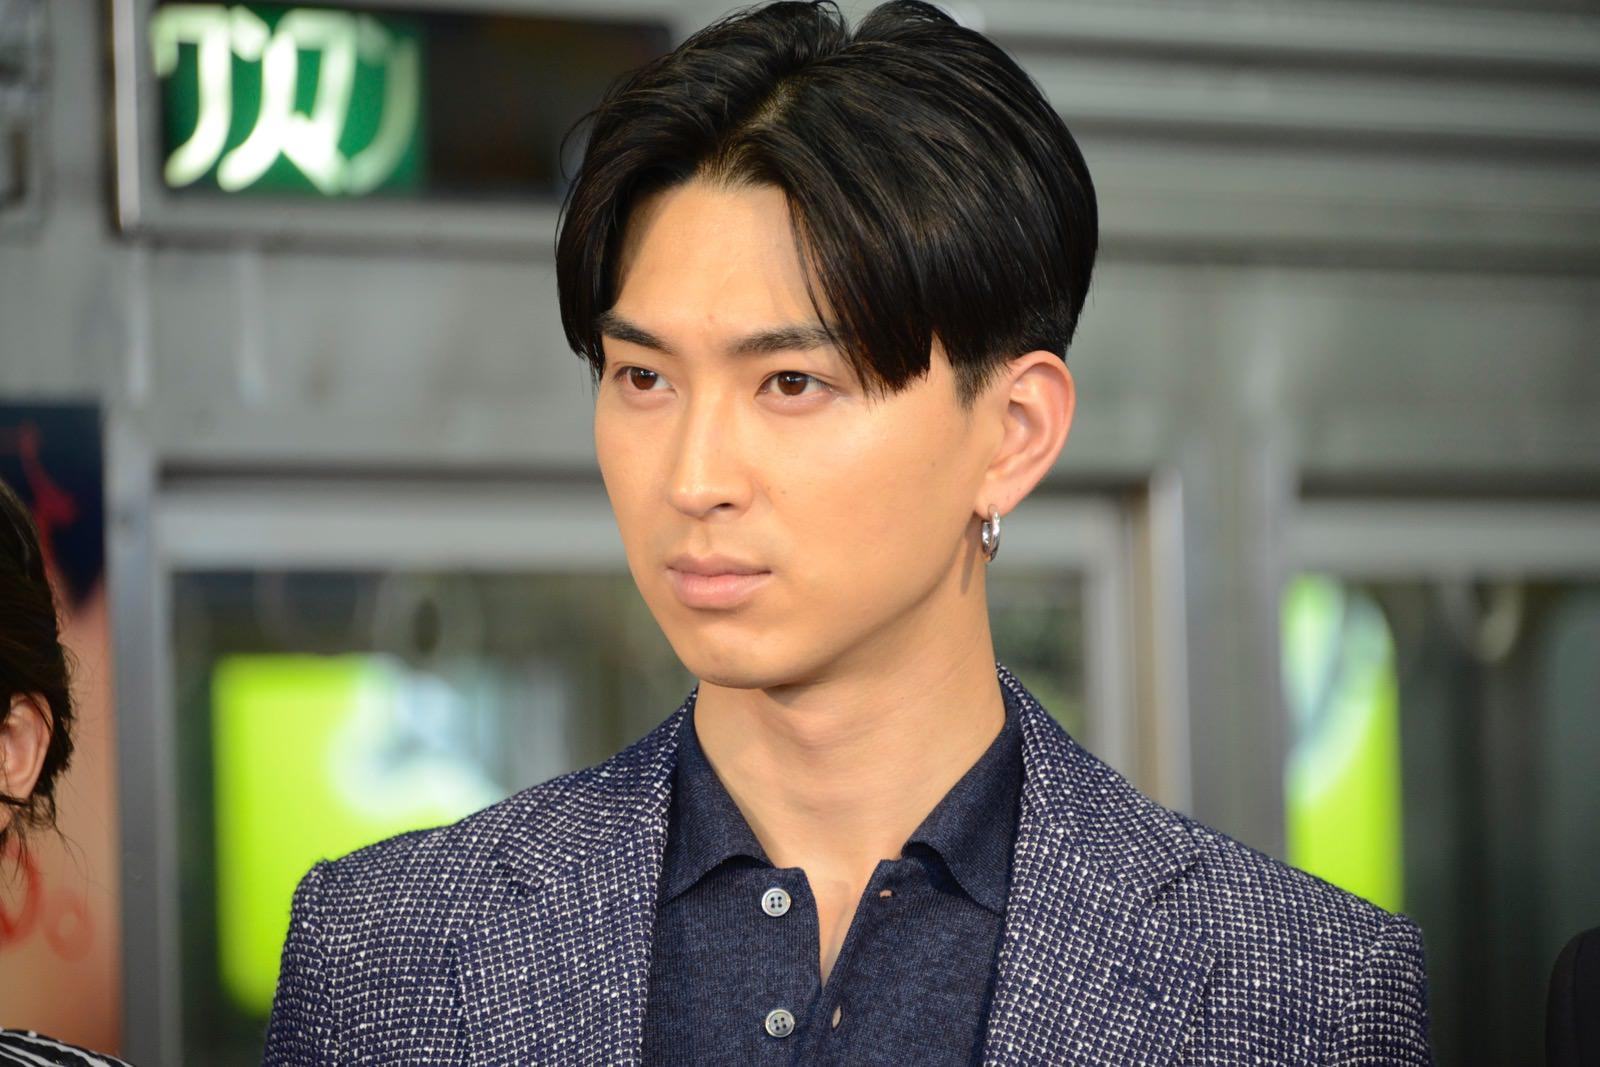 img 5a6d709f0a8ed.png - 熱愛報道の松田翔太。恋多きうわさもついに年貢の納め時か。